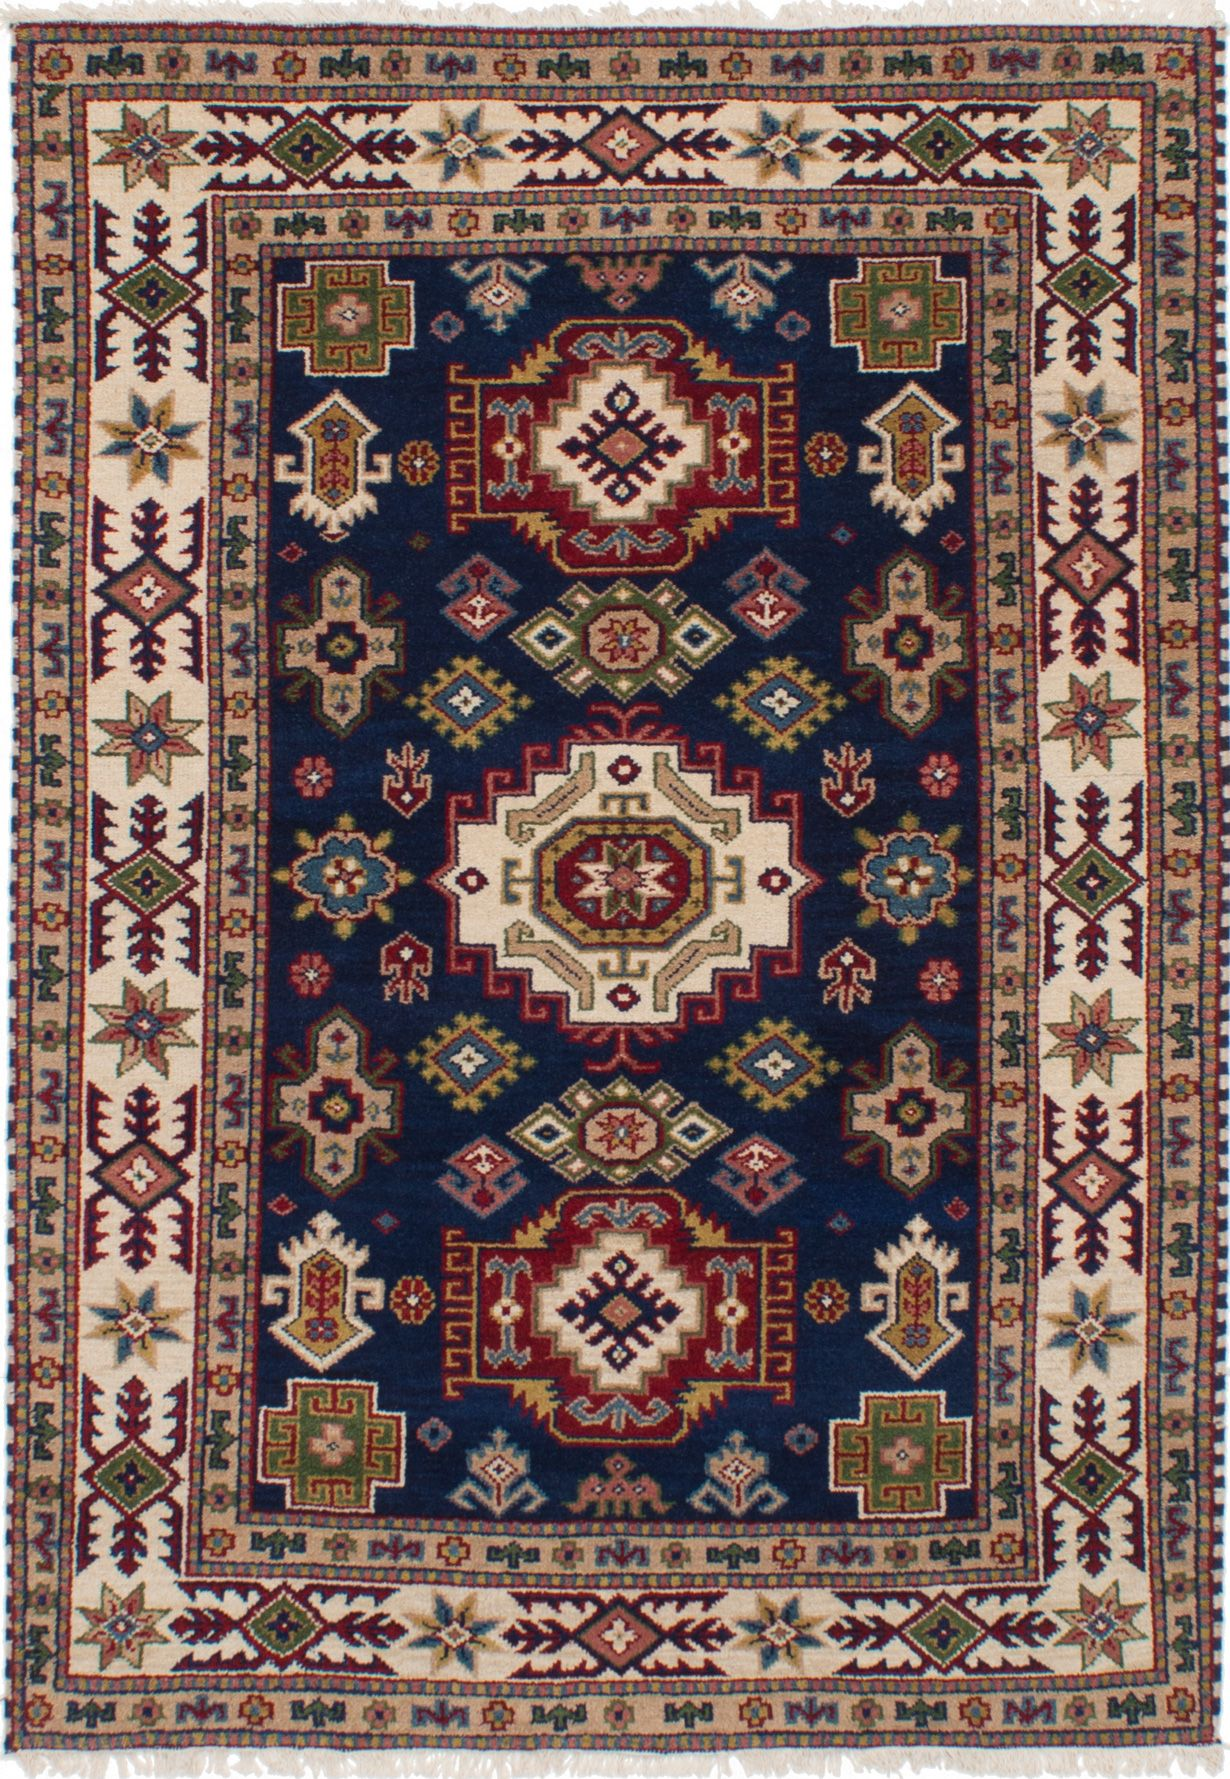 "Hand-knotted Finest Kazak Navy Blue Wool Rug 5'4"" x 7'7"" Size: 5'4"" x 7'7"""